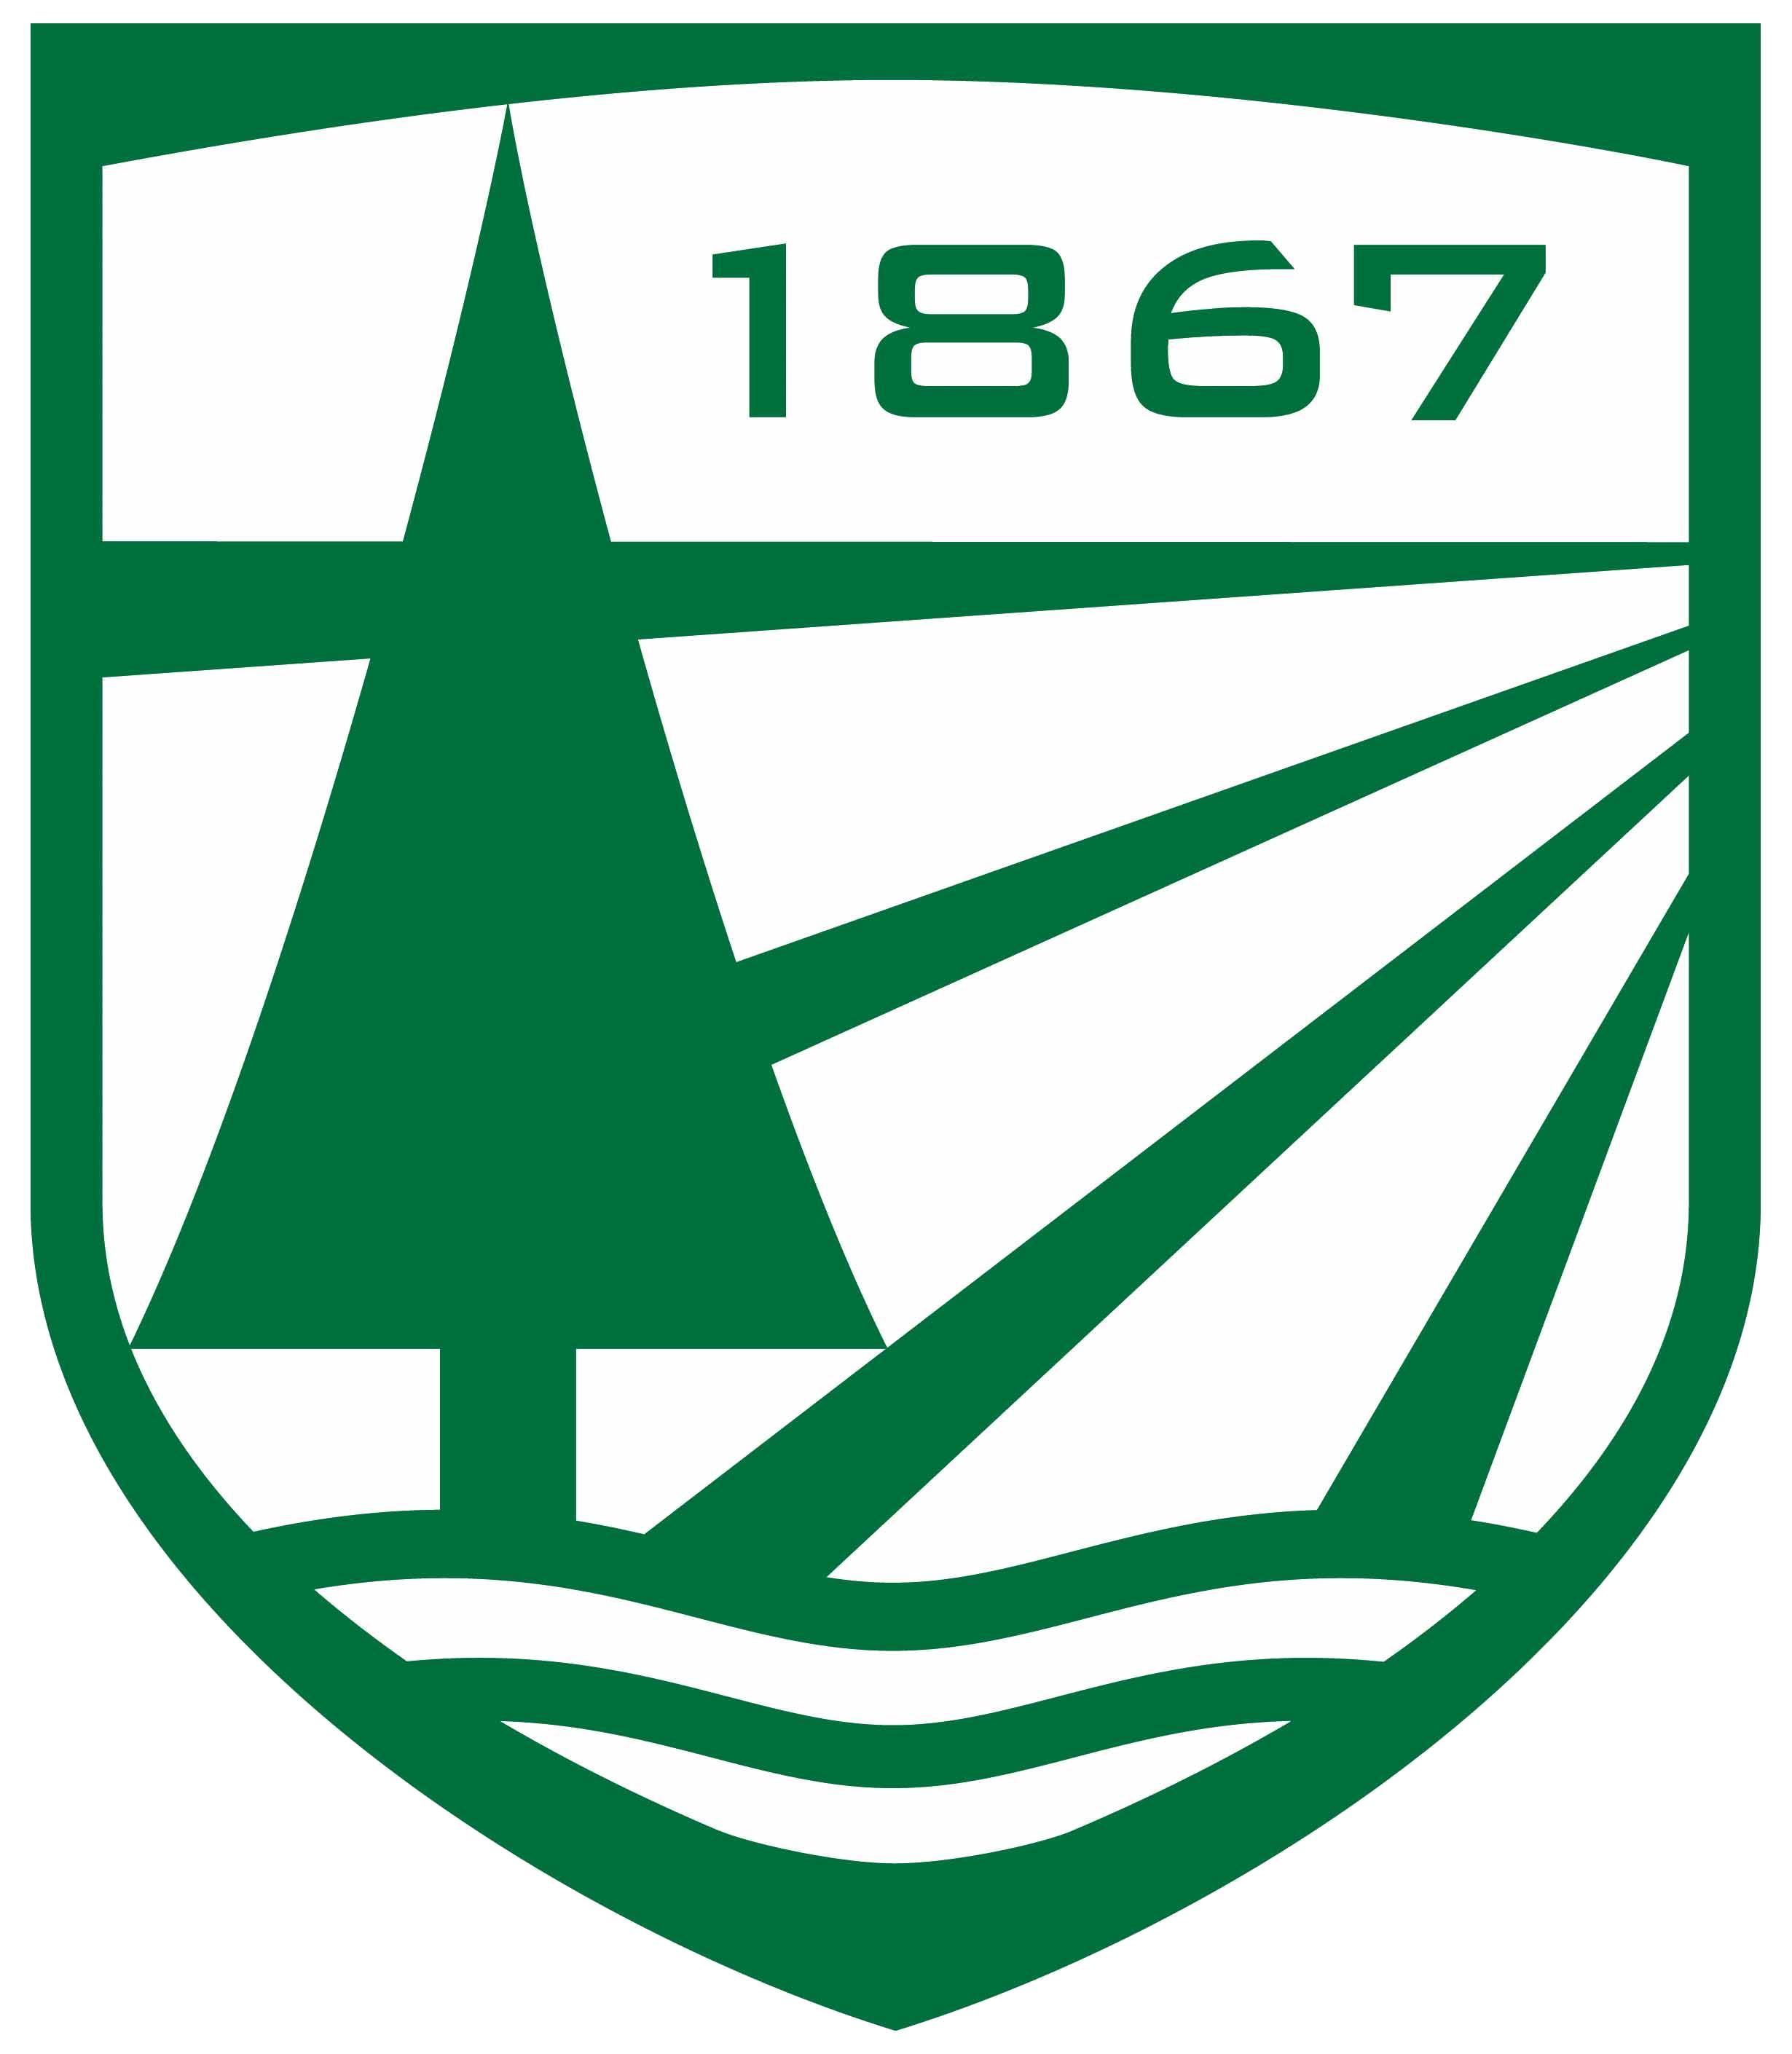 Thayer School of Engineering Logo